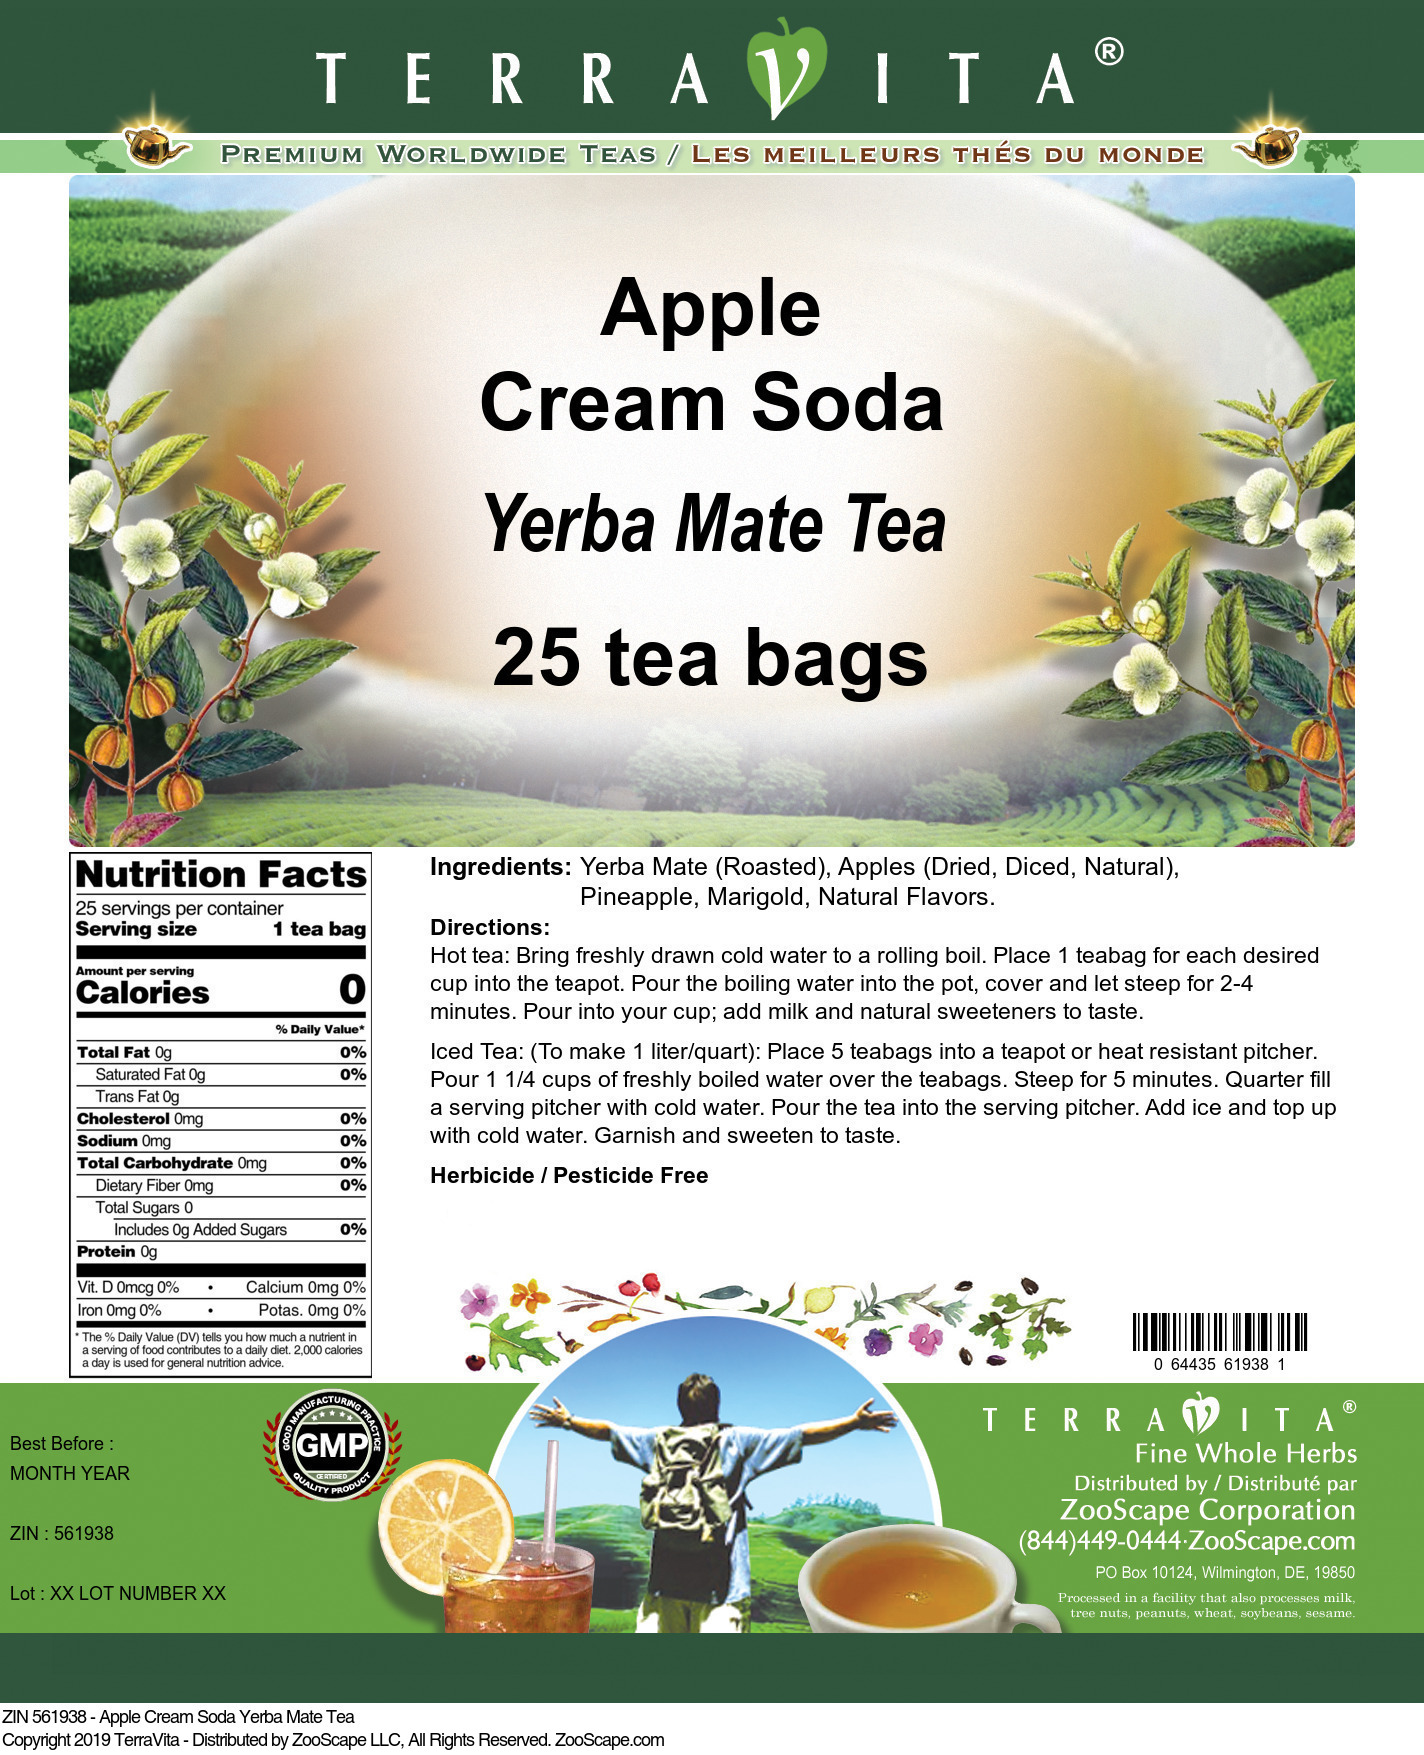 Apple Cream Soda Yerba Mate Tea